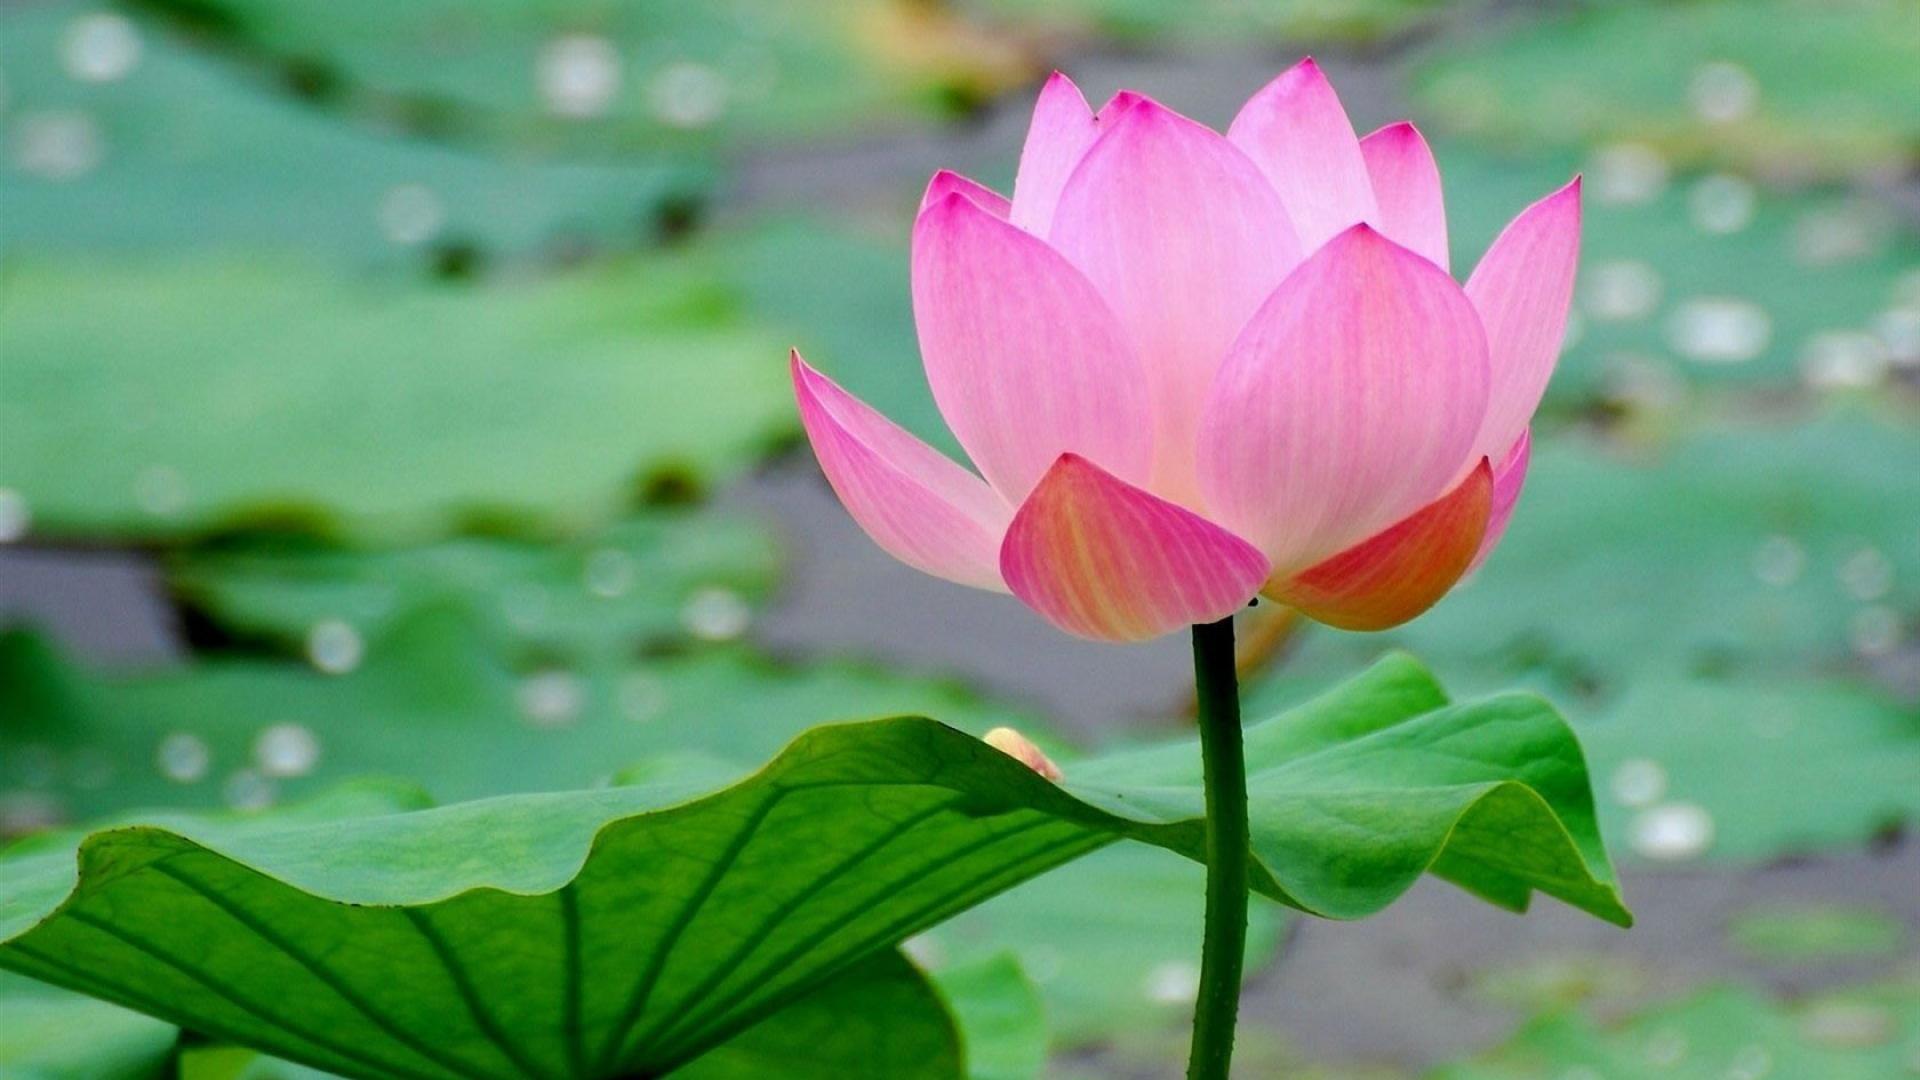 lotus flower wallpaper lotus pink paper house flowers desktop flower hd wallpaper